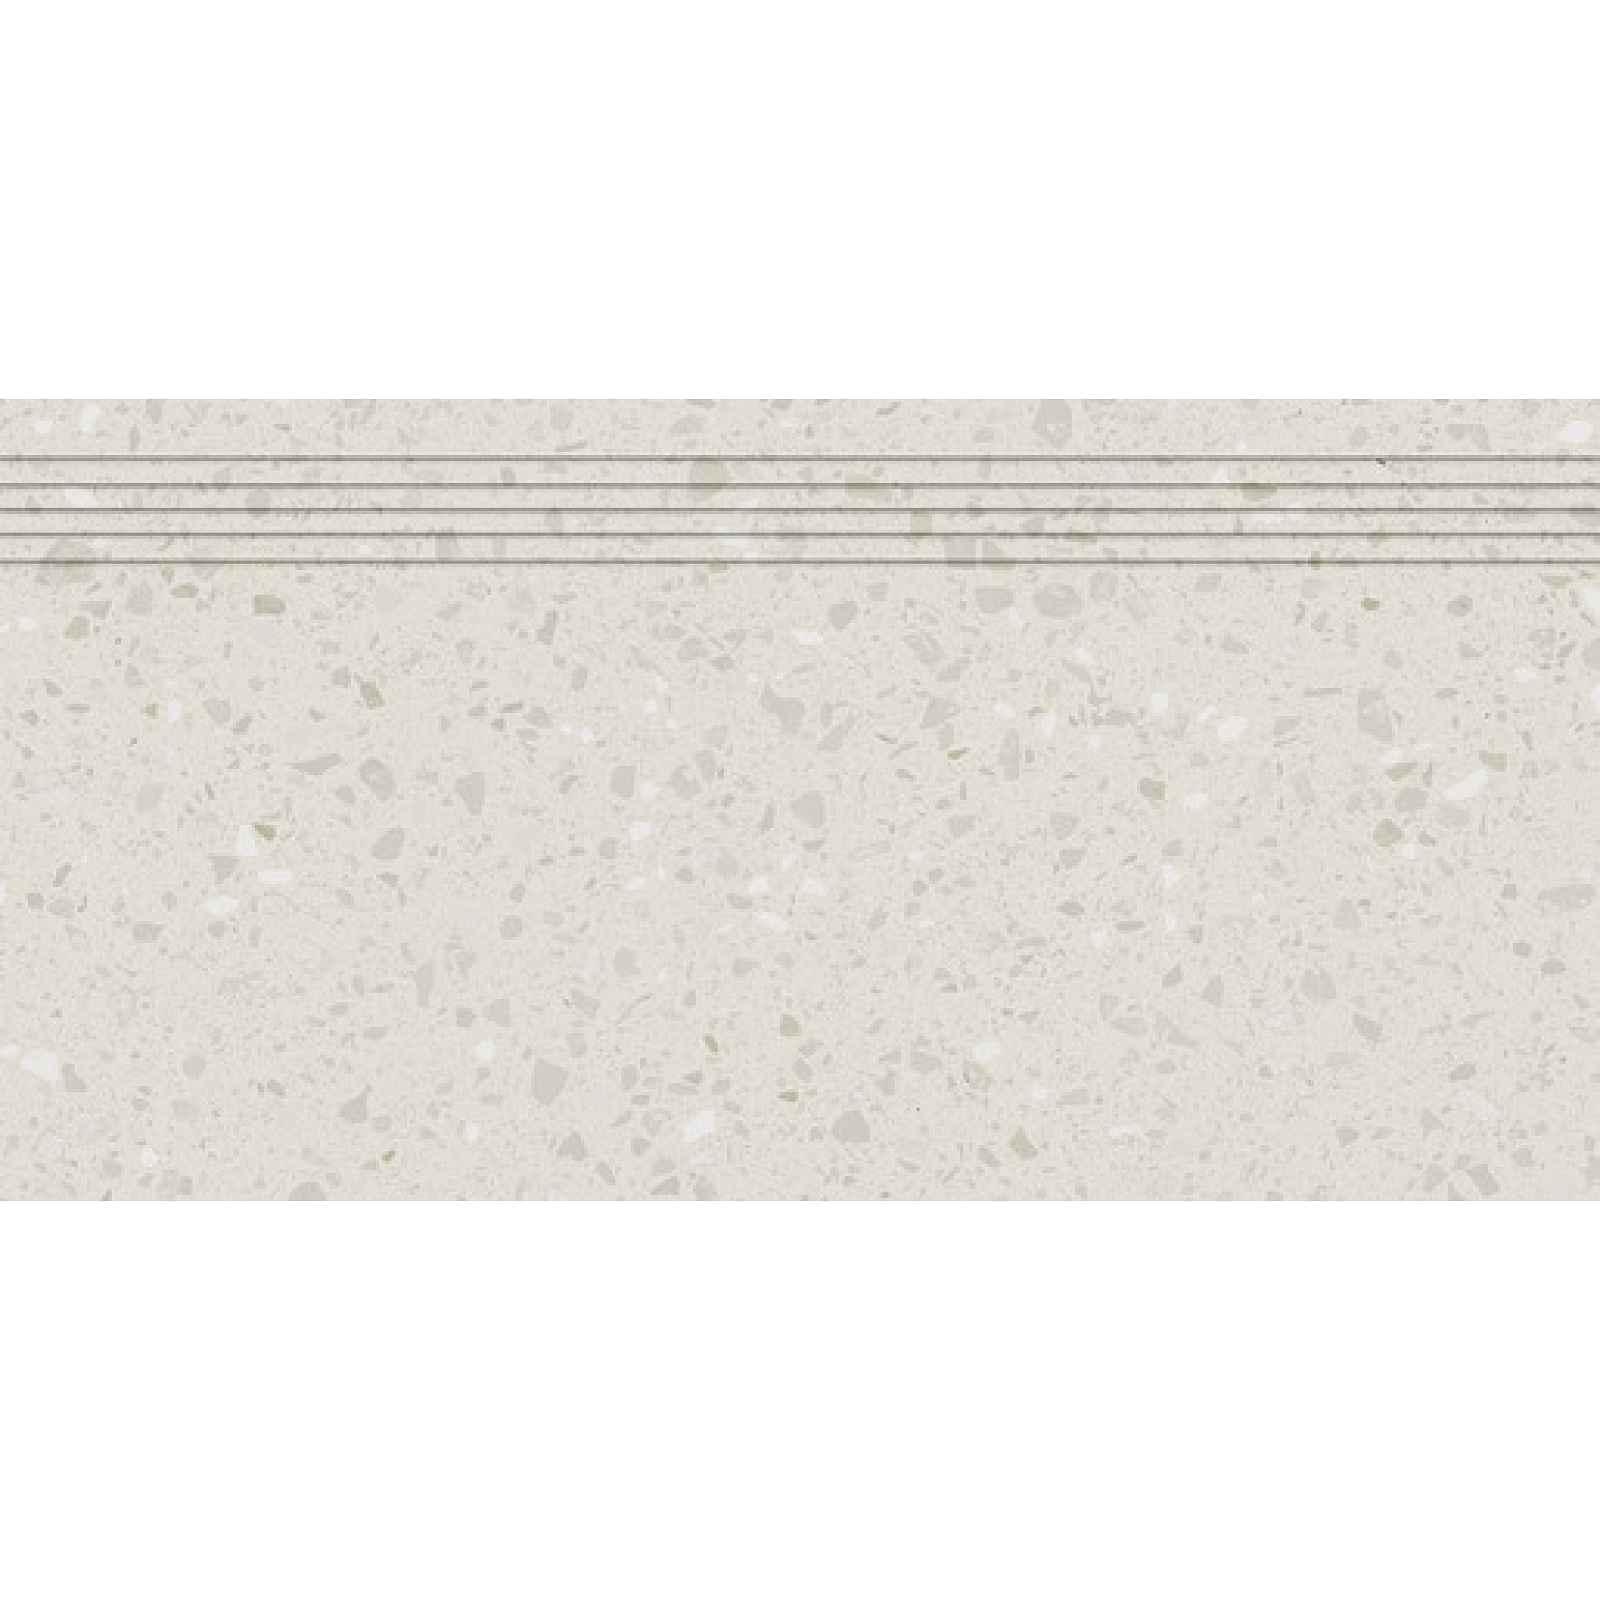 Schodovka RAKO Porfido béžová 30x60 cm mat / lesk DCPSE813.1